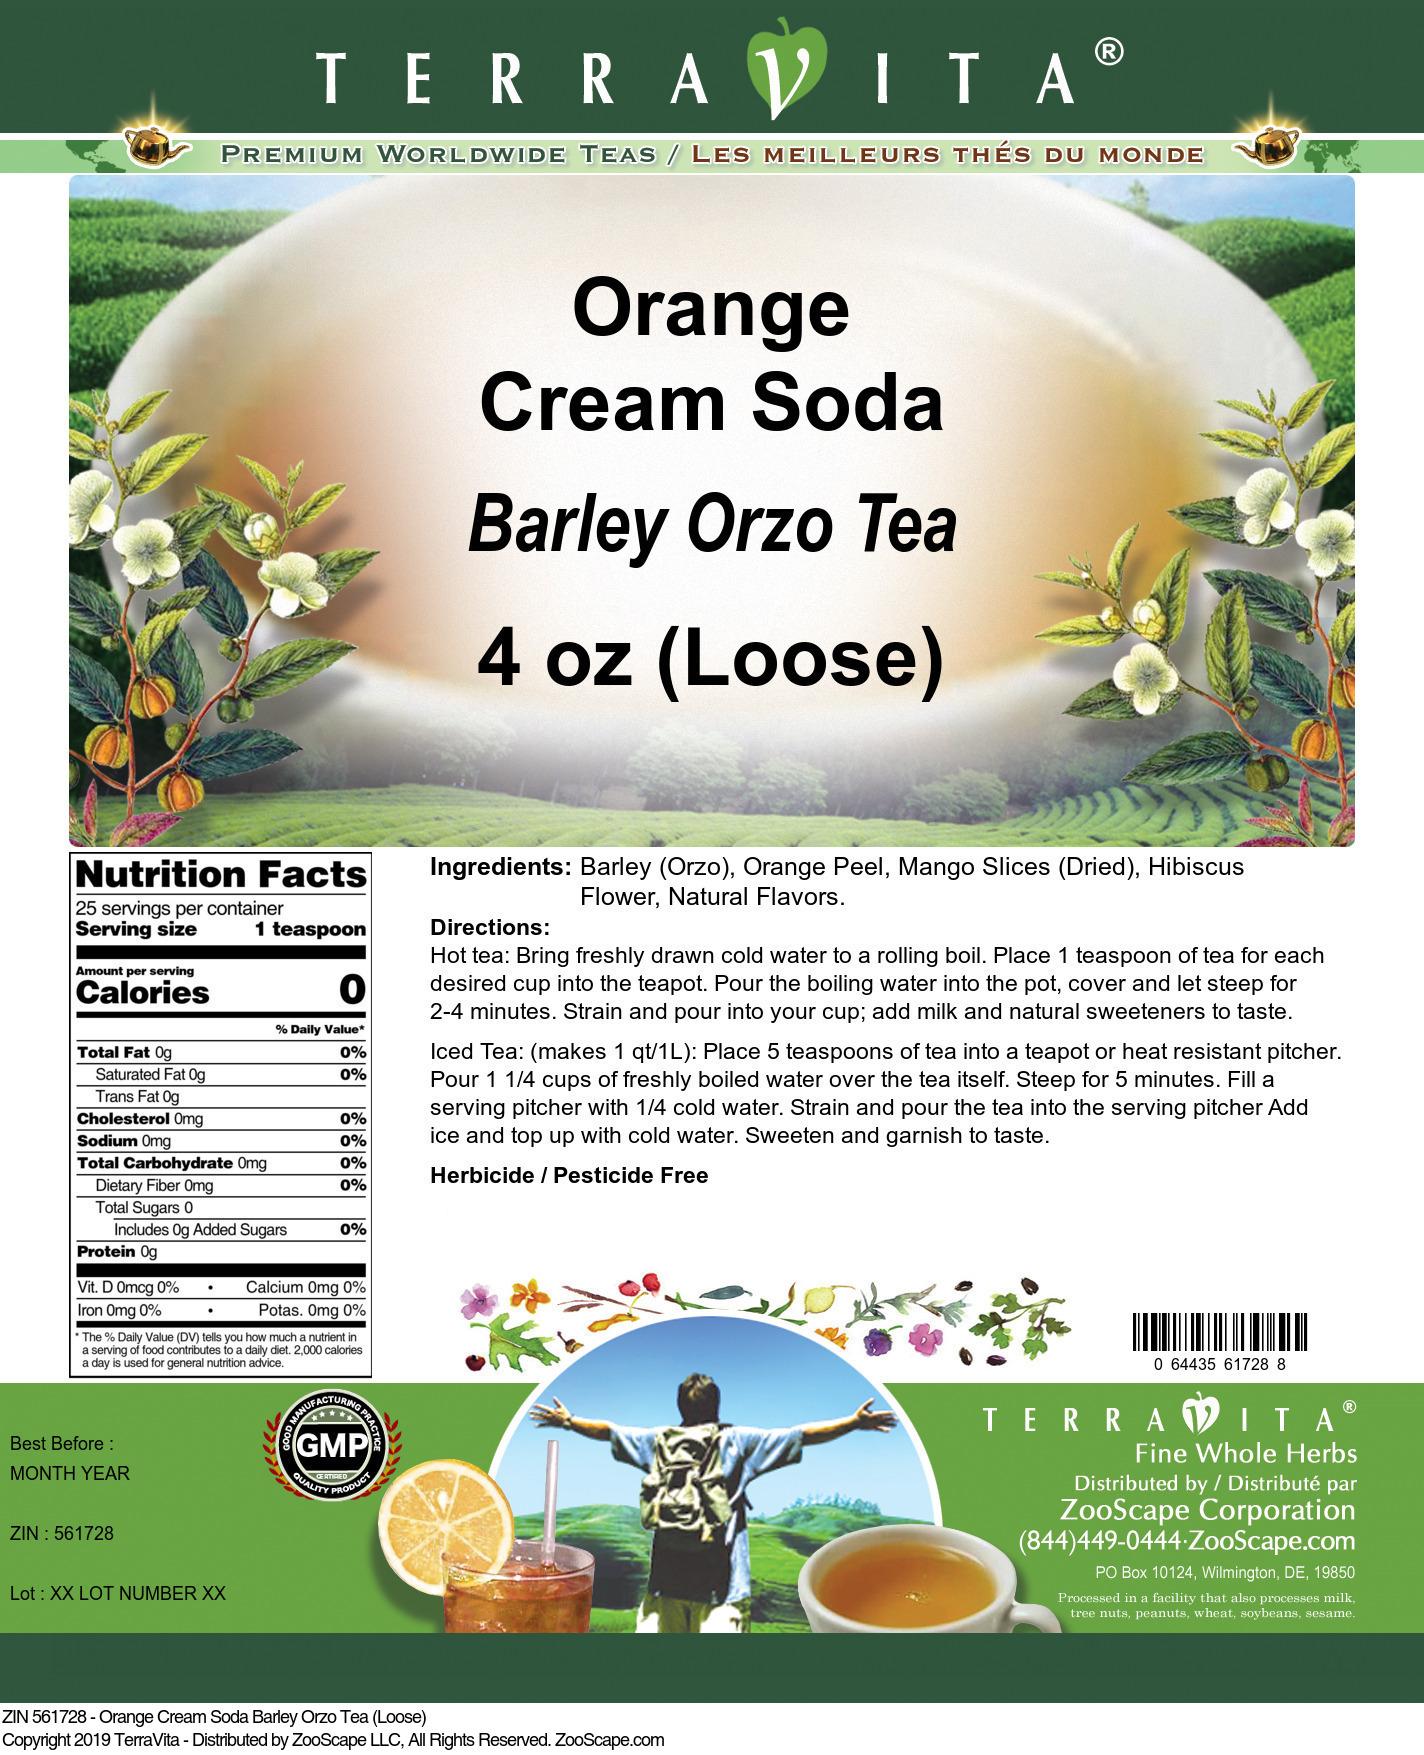 Orange Cream Soda Barley Orzo